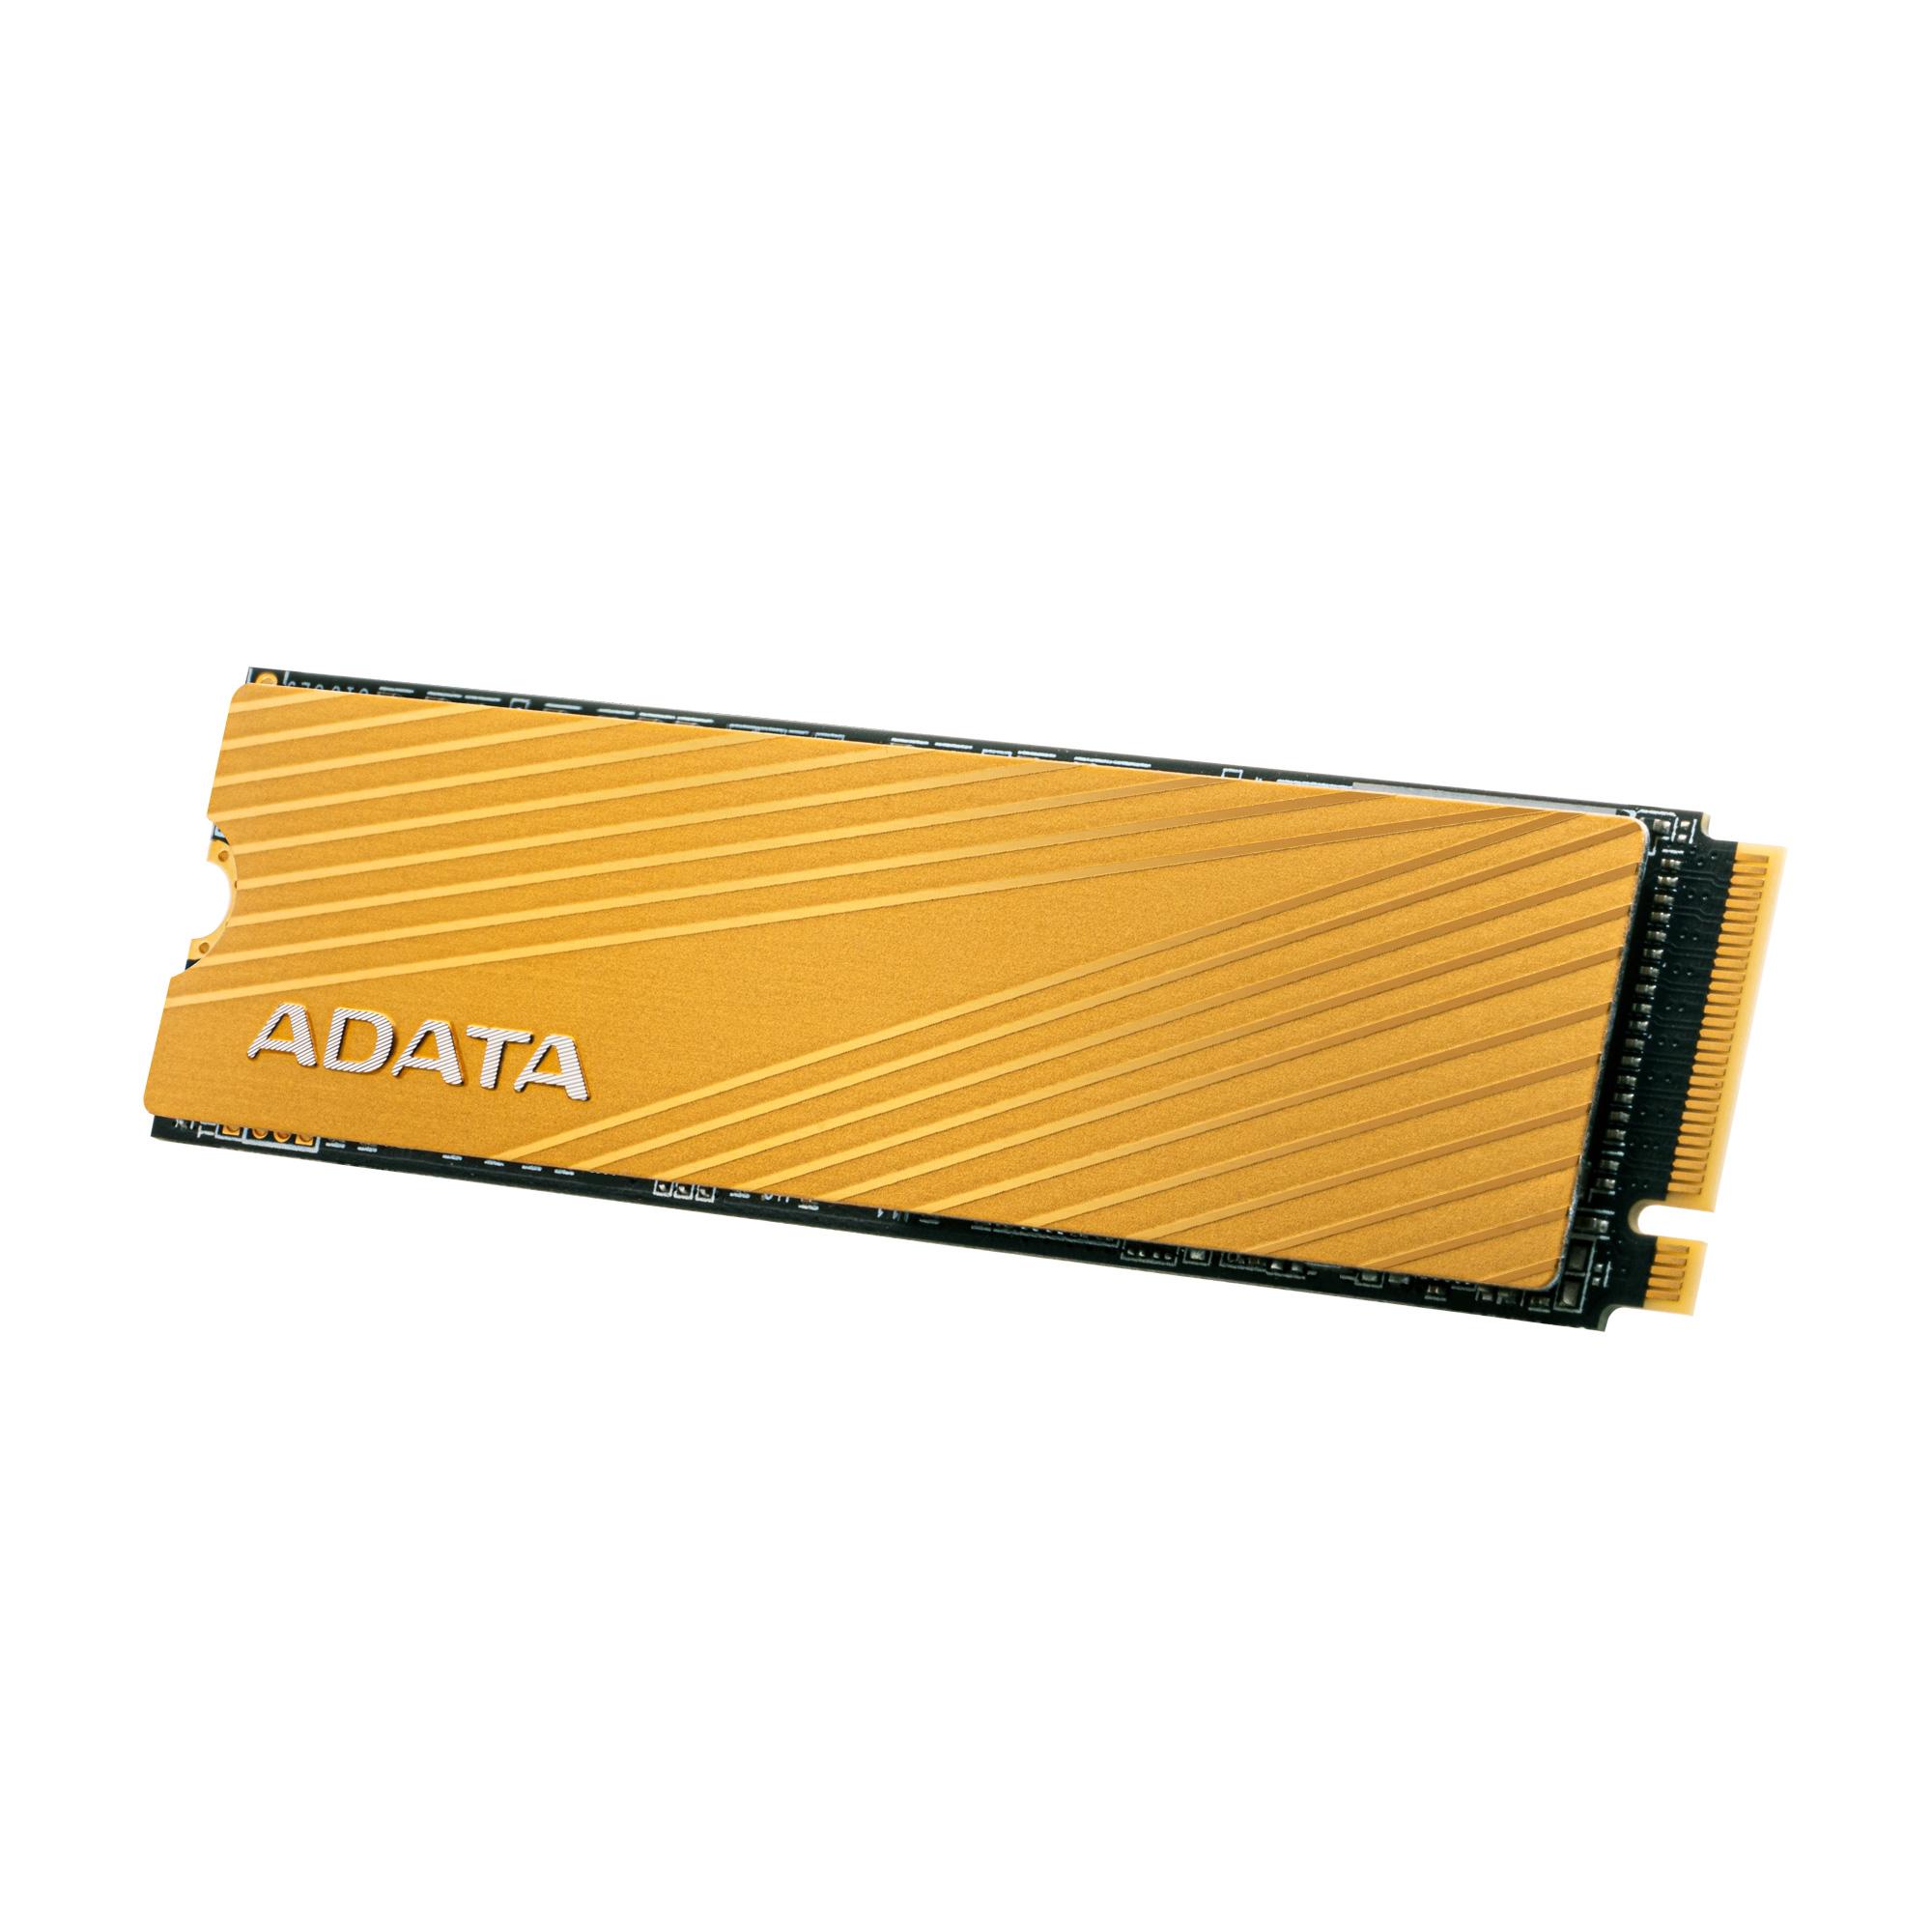 SSD 256 GB. M.2 ADATA AFALCON NVME BULK